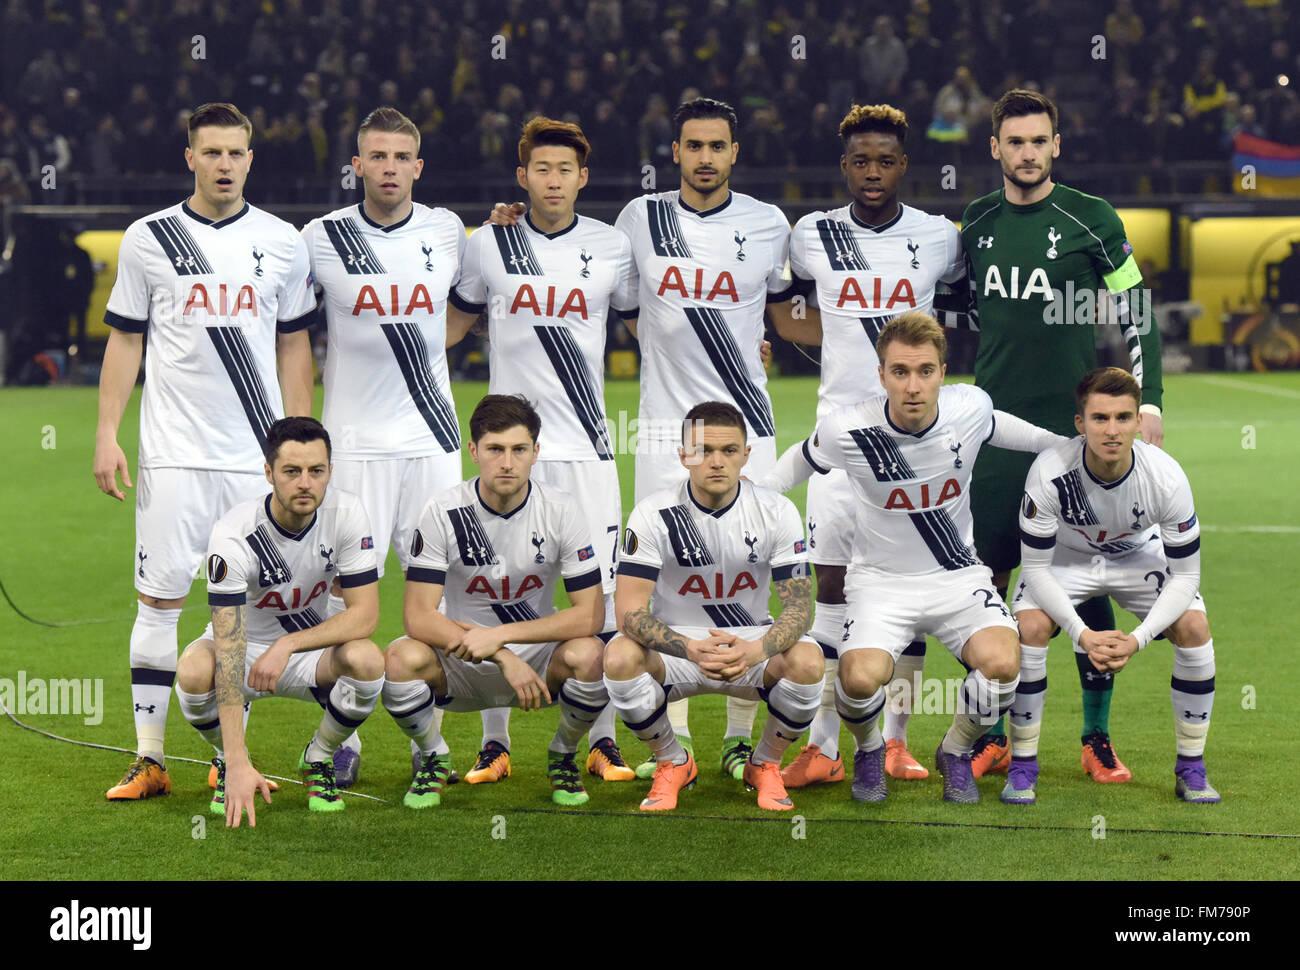 tottenham hotspur football team - photo #20